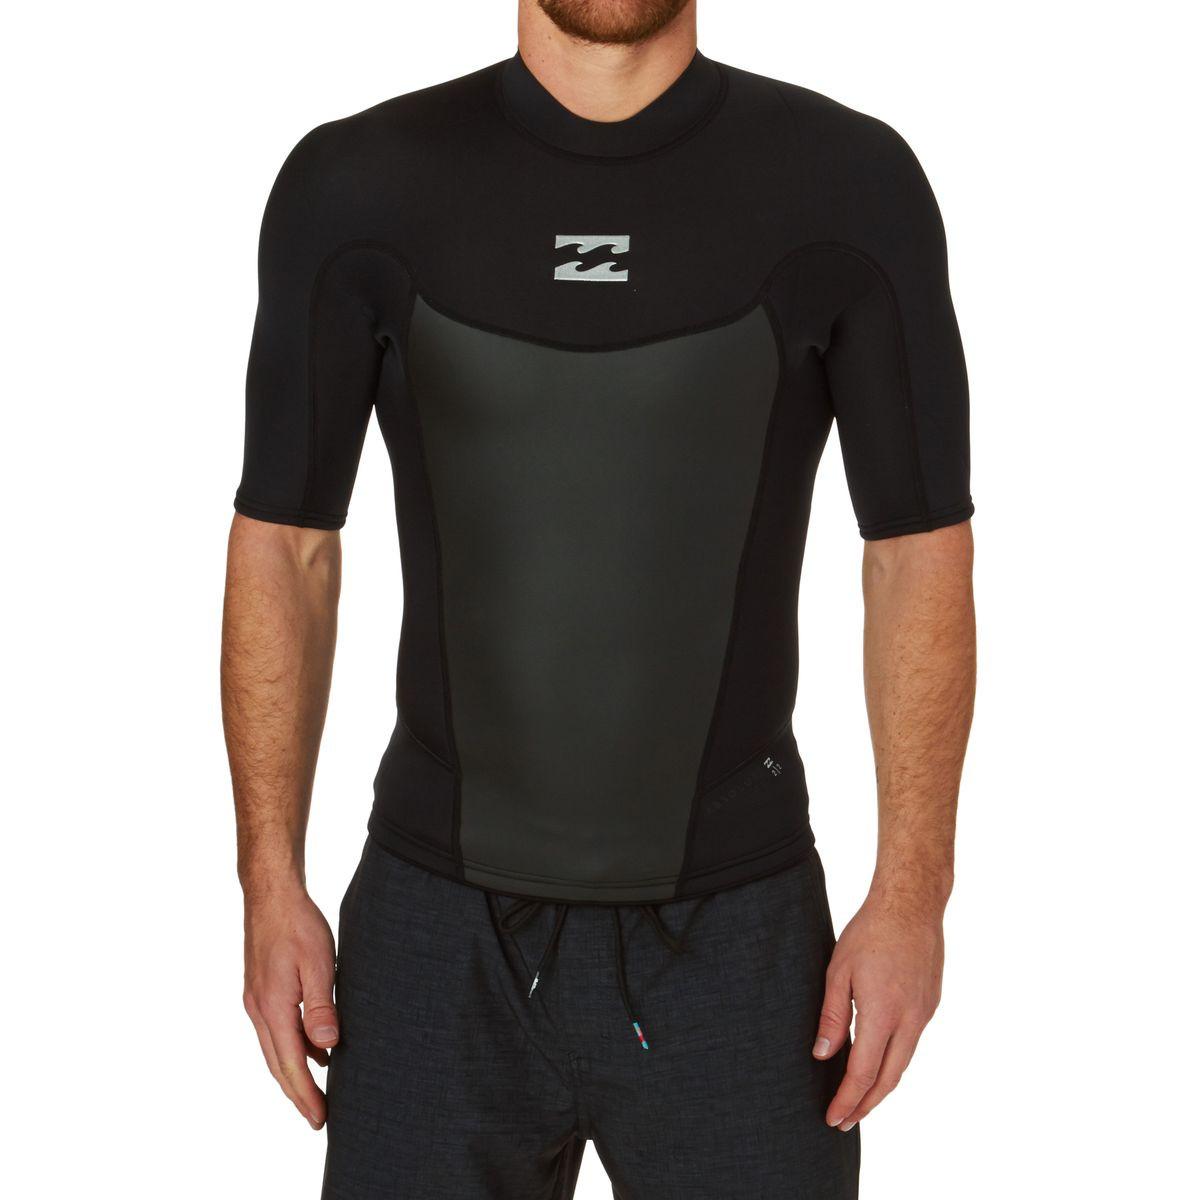 Billabong Absolute Comp 2mm 2017 Back Zip Short Sleeve Wetsuit Jacket - Black